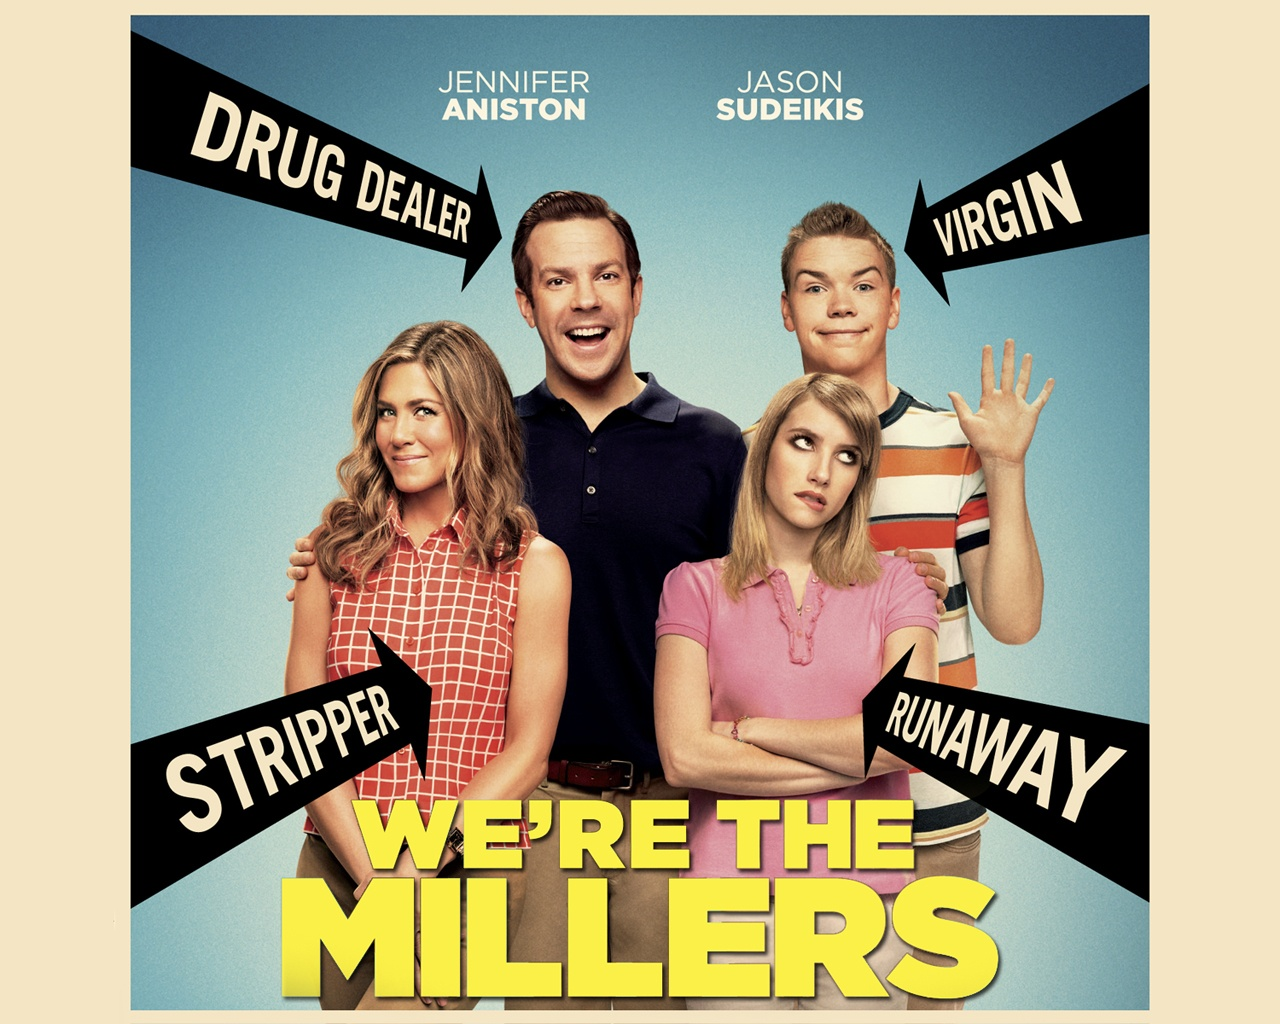 We're The MillerS 2013 Full Movie DVDRIP